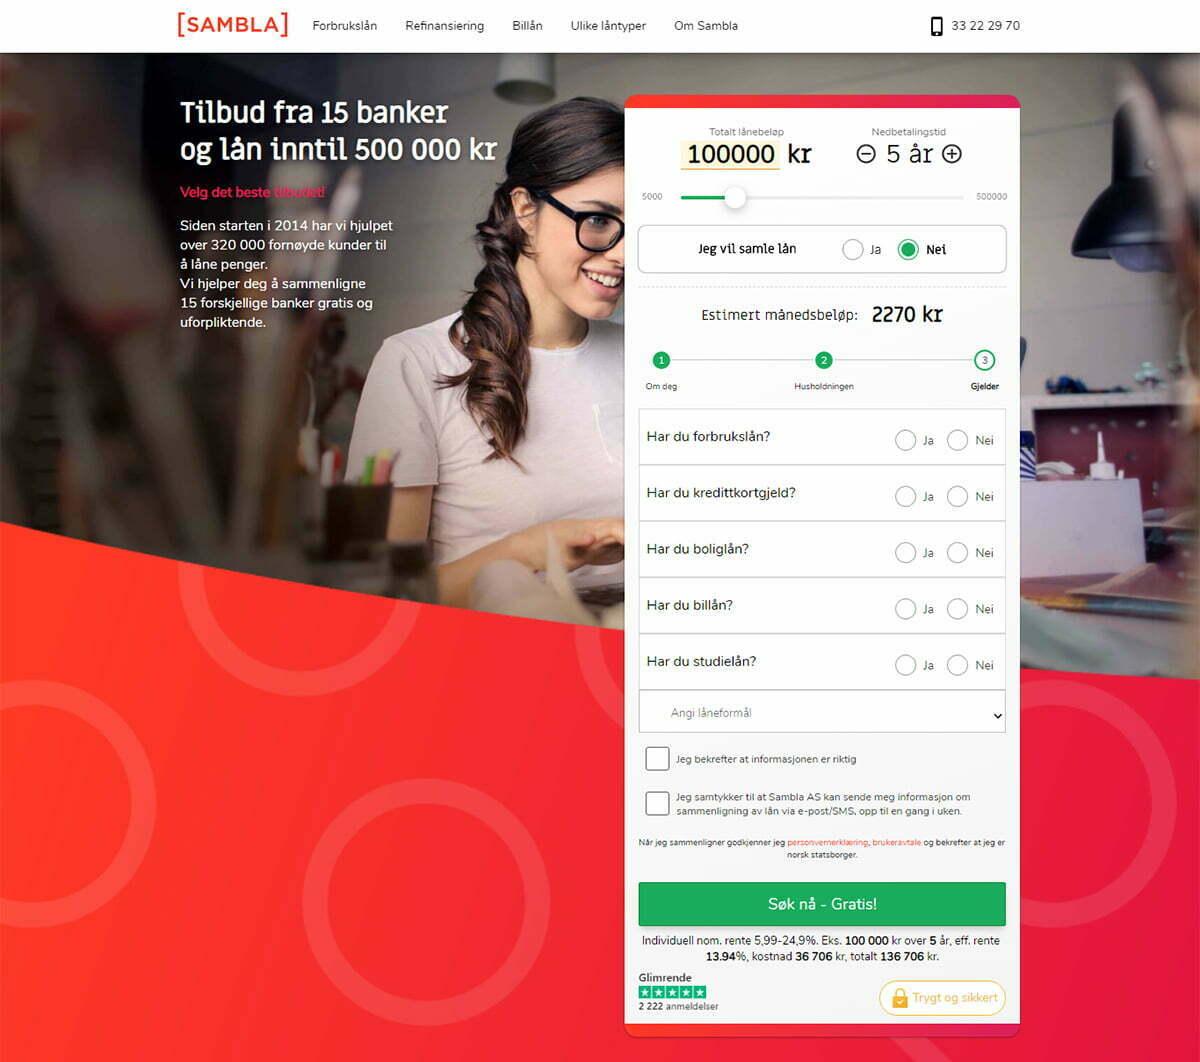 Anmeldelse av Sambla| siste trinn i lånesøknaden